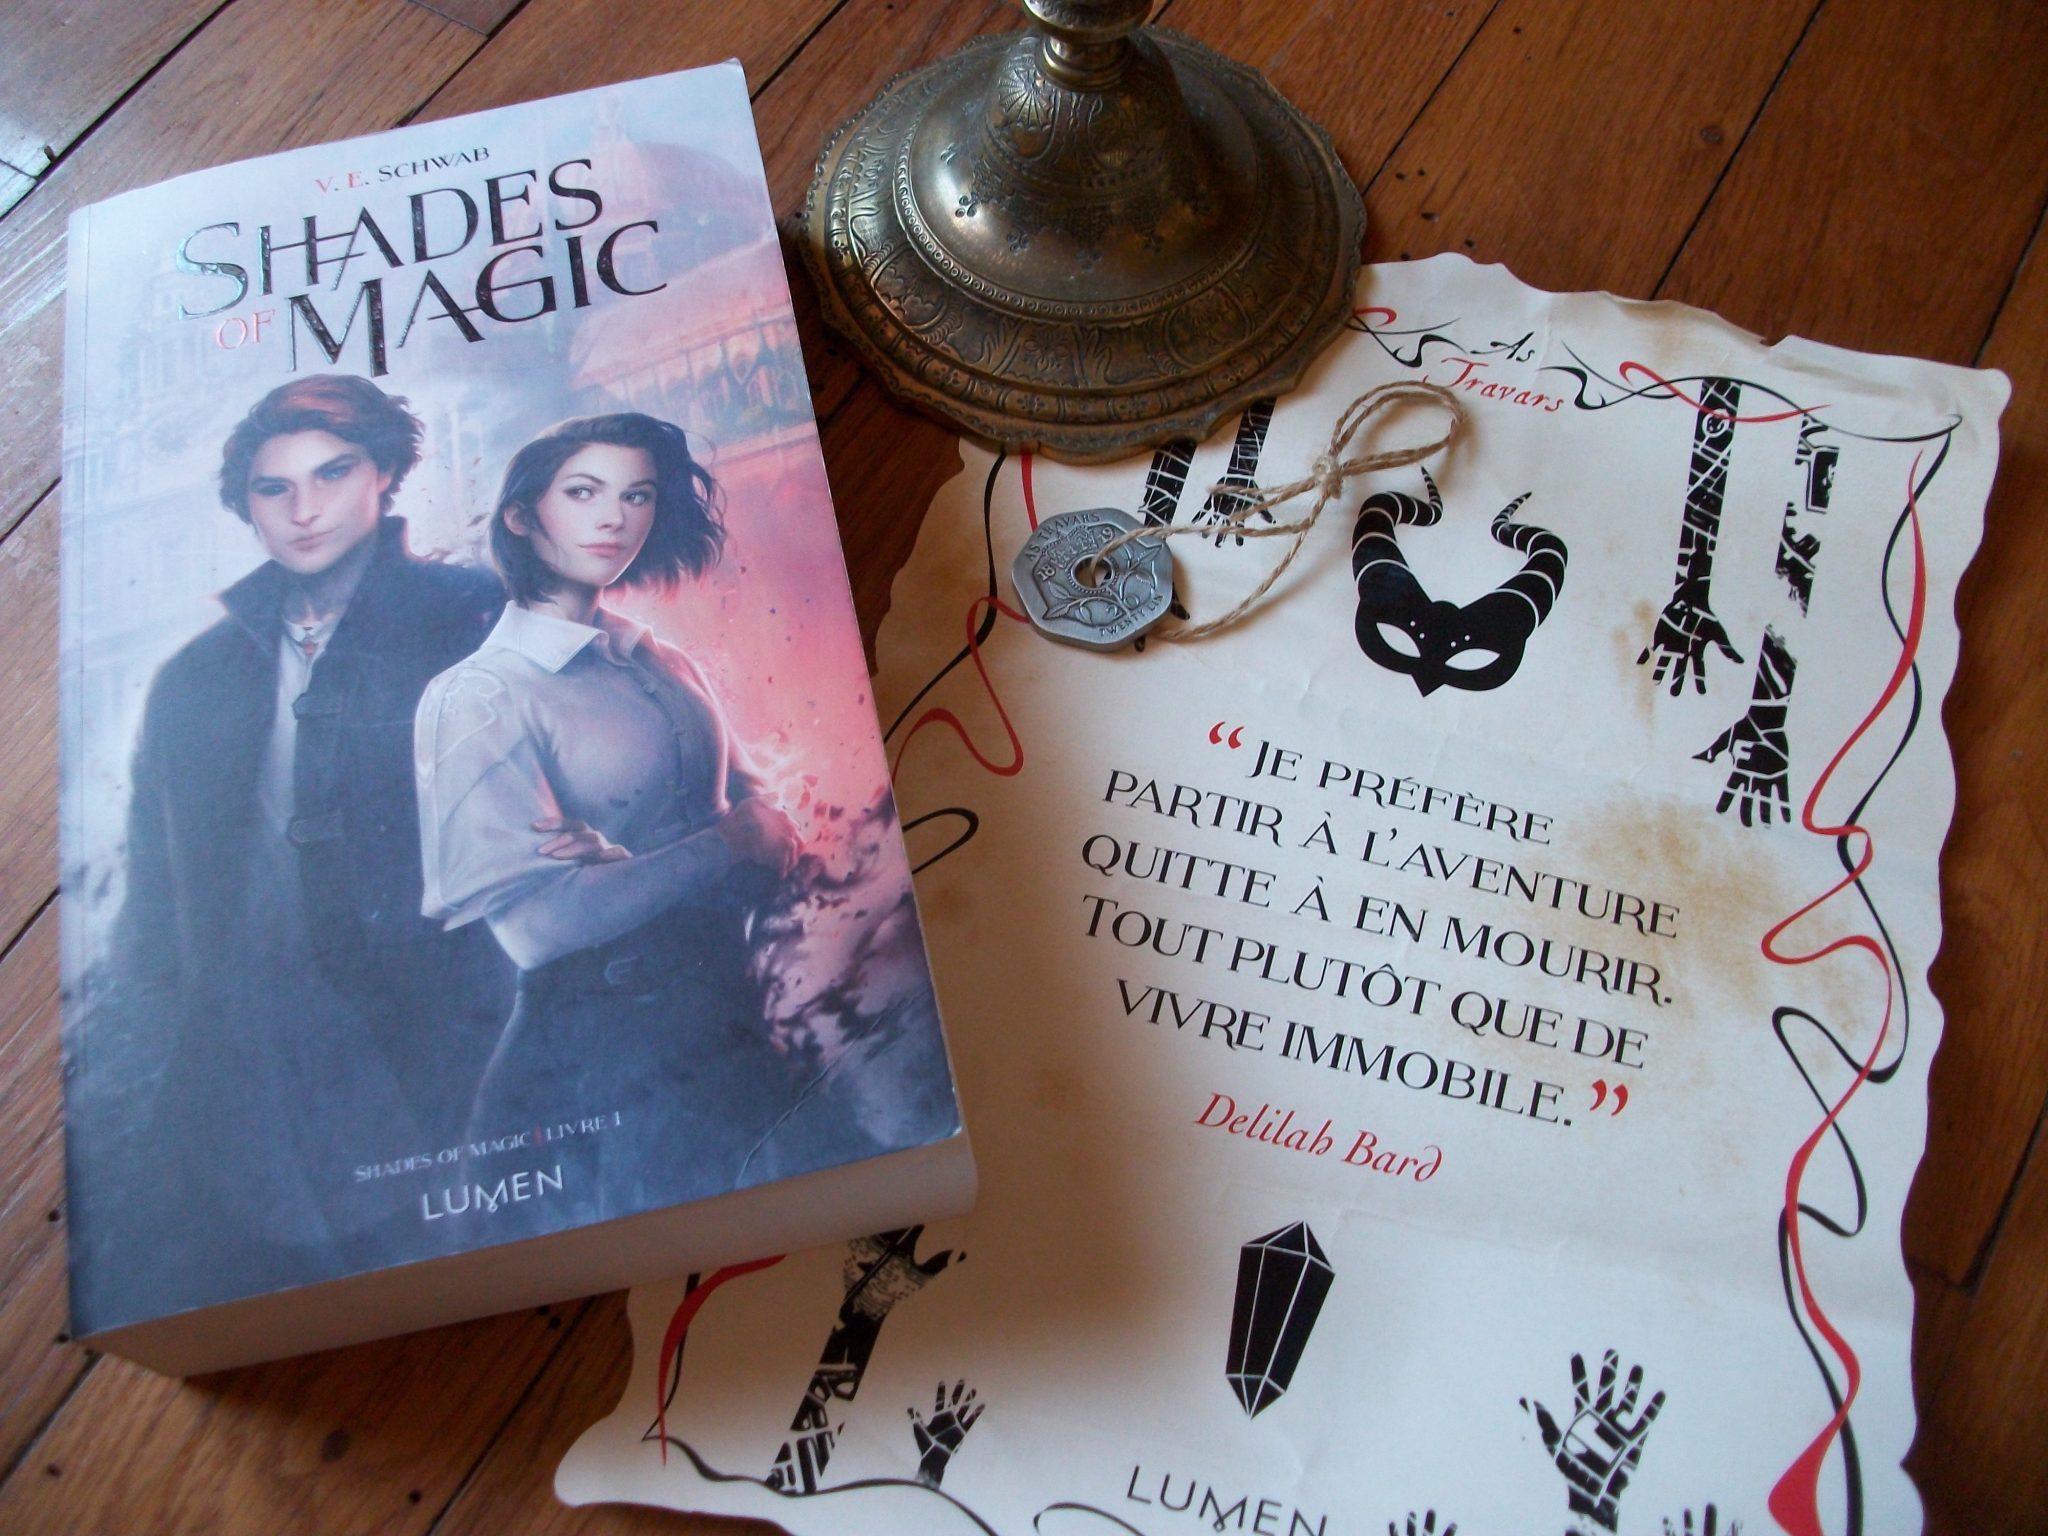 Shades of magic, V.E. Schwab, Lumen